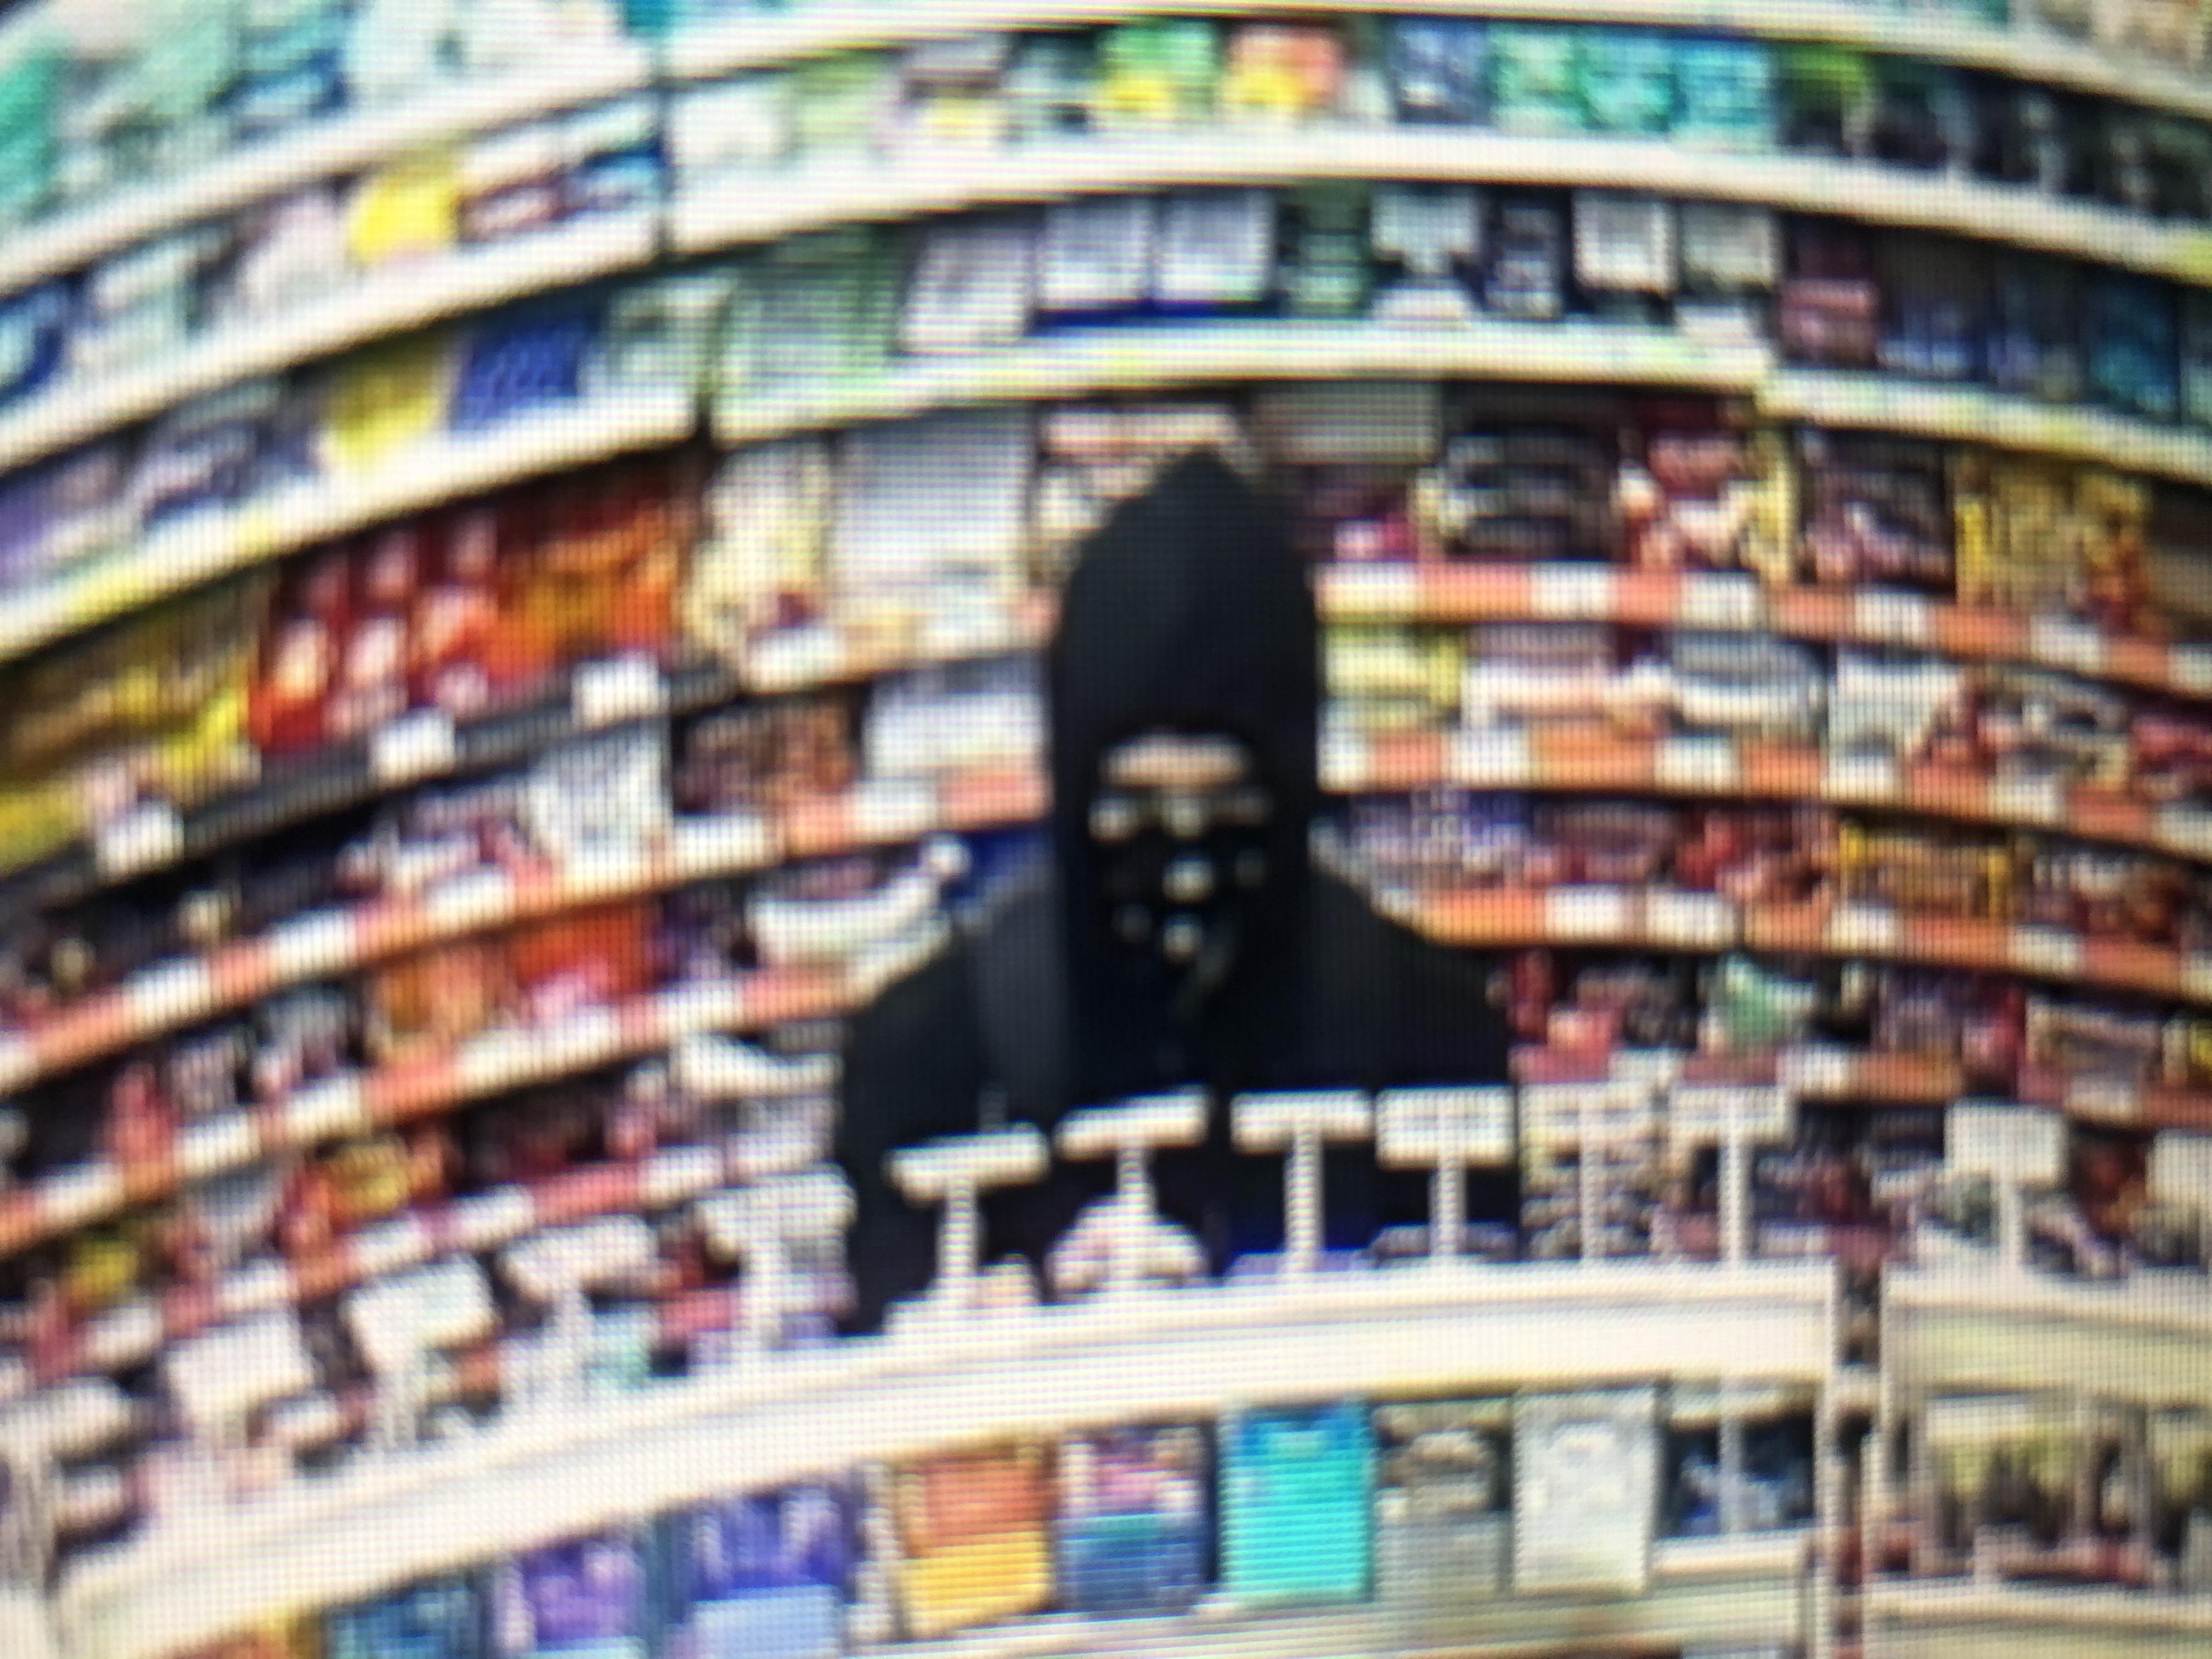 Image 4: Robbery Suspect